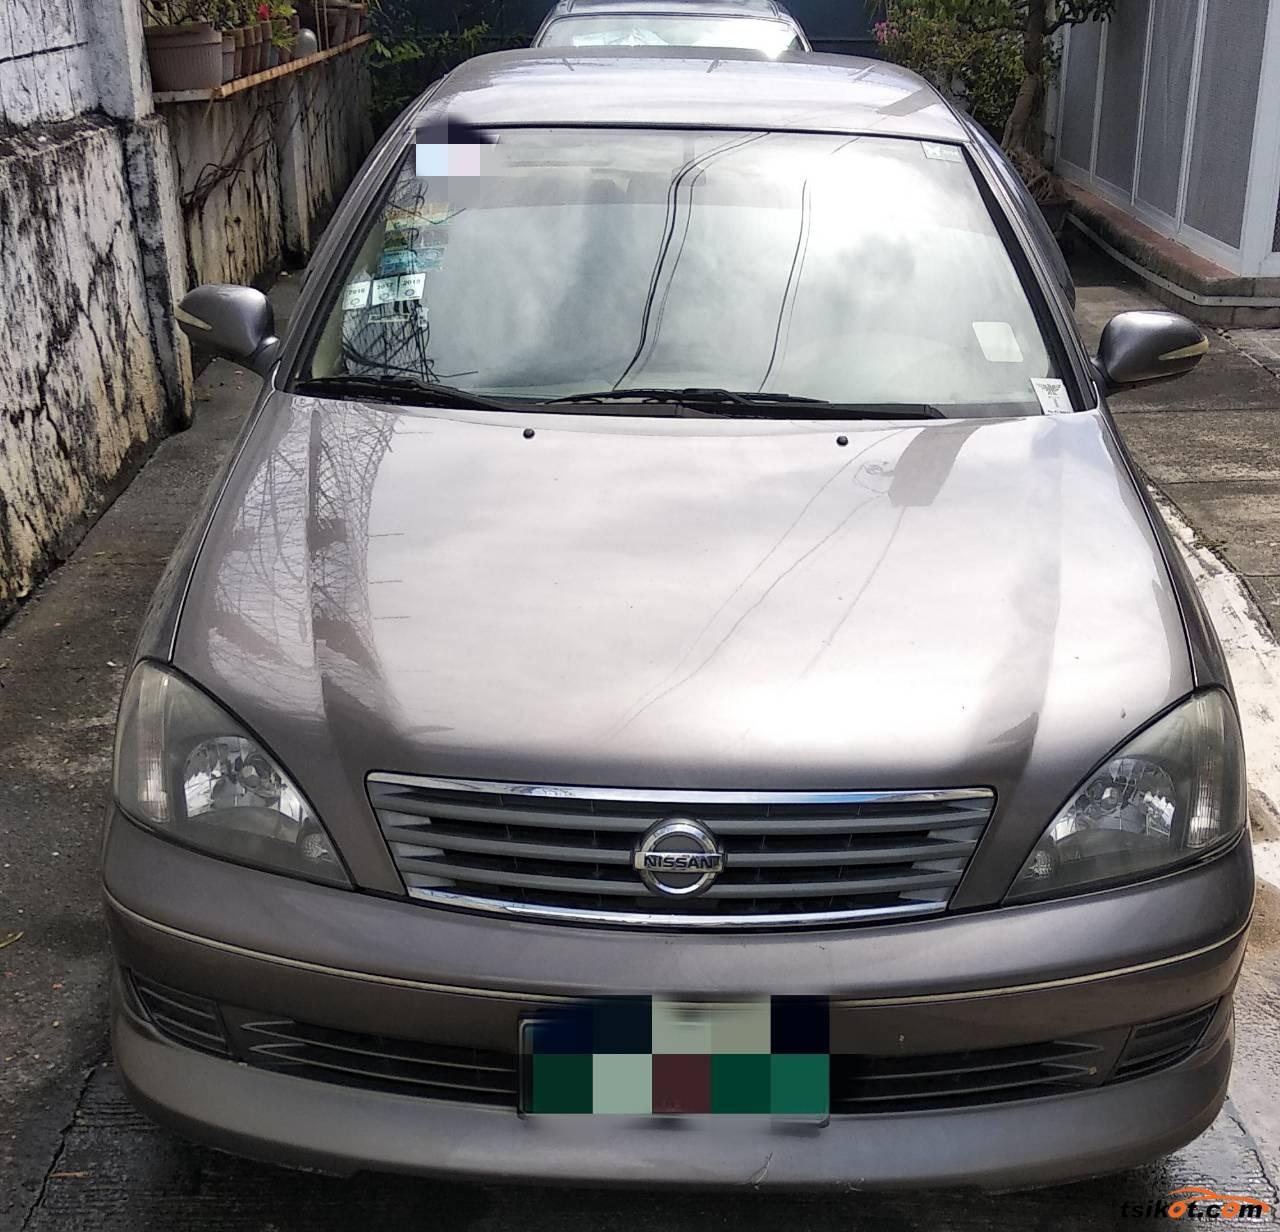 Nissan Sentra 2007 - 1